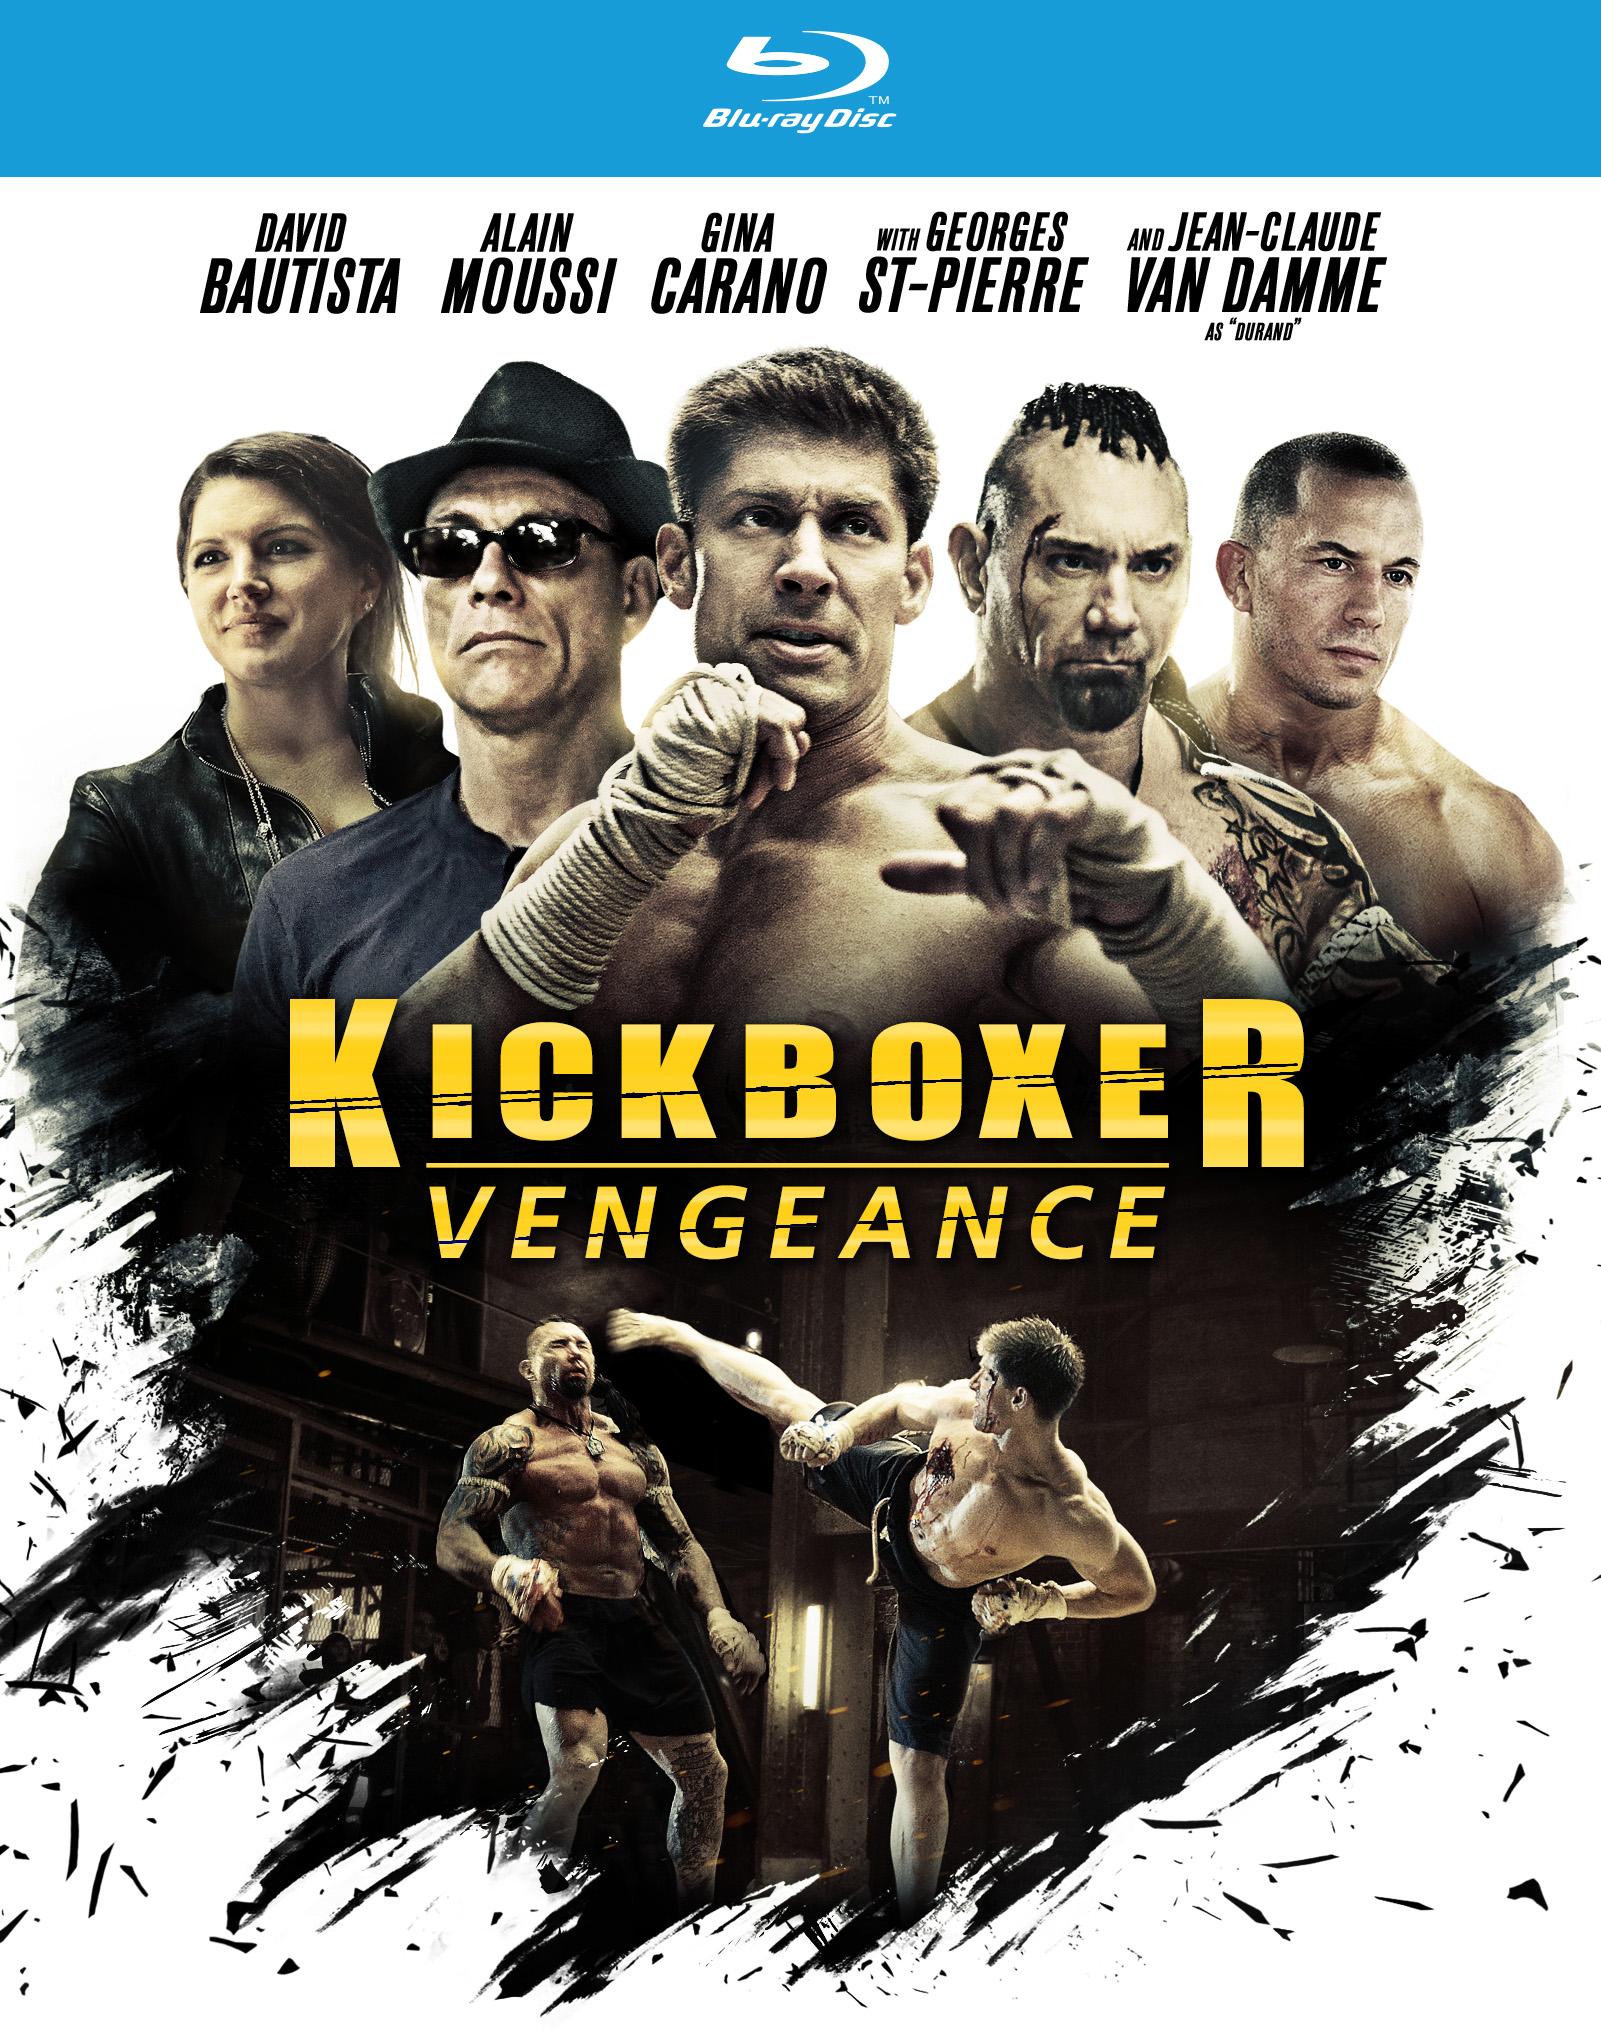 Kickboxer: Vengeance [blu-ray] 5581531